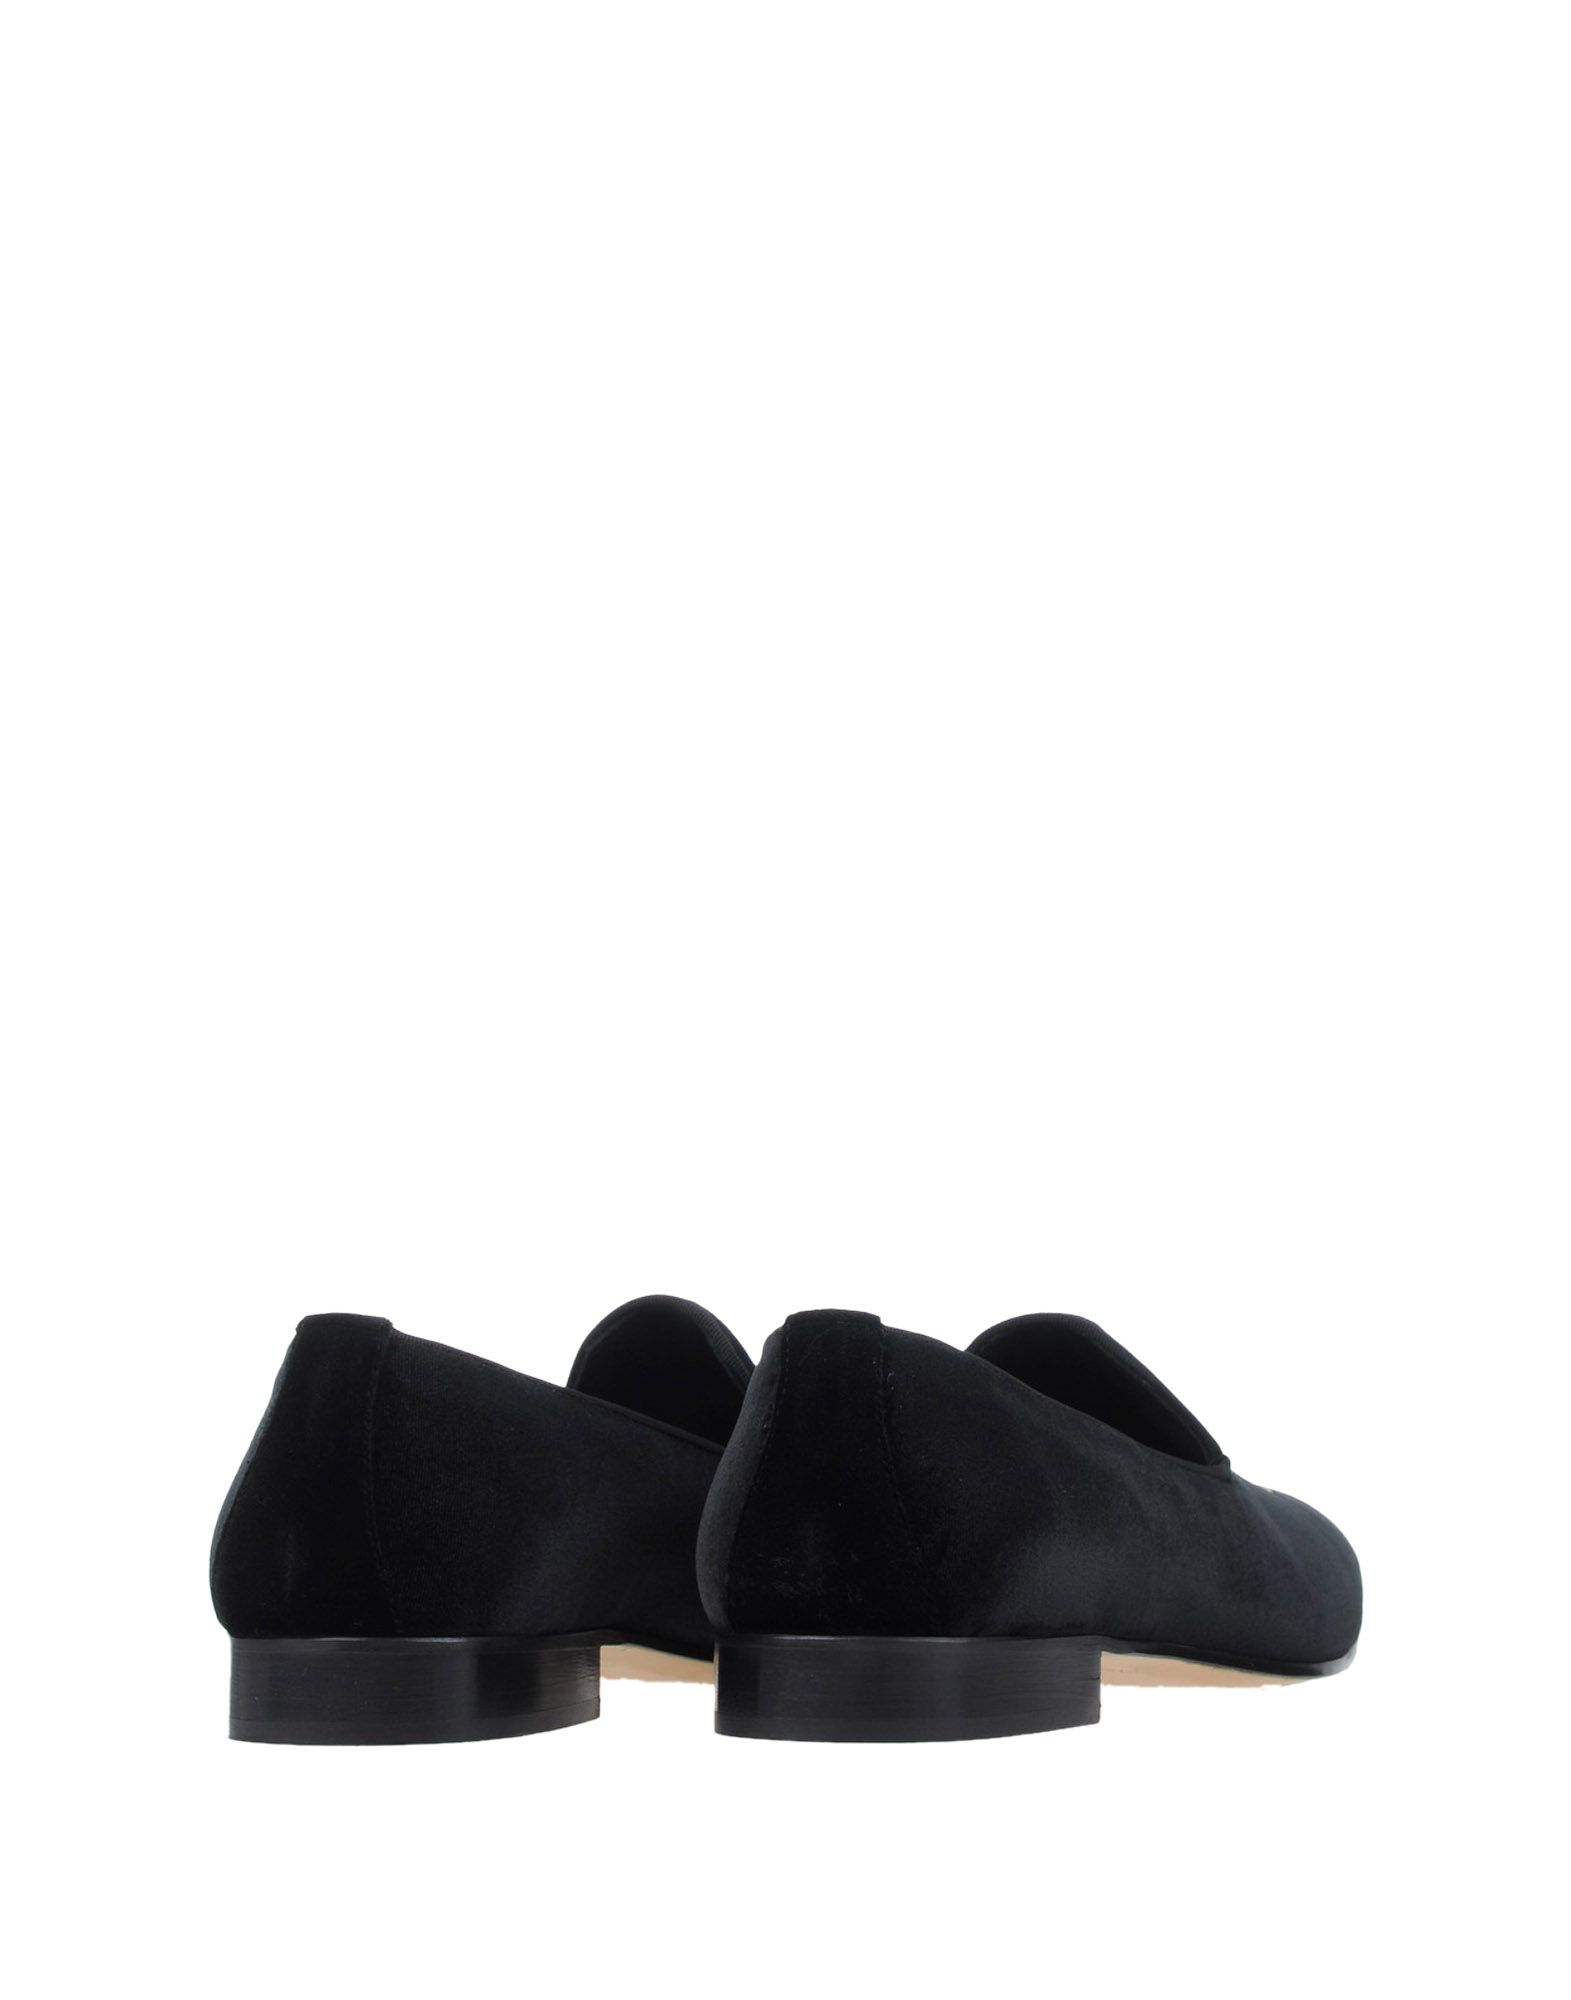 Luca Di Napoli Mokassins Herren  11092103DR Gute Qualität beliebte Schuhe